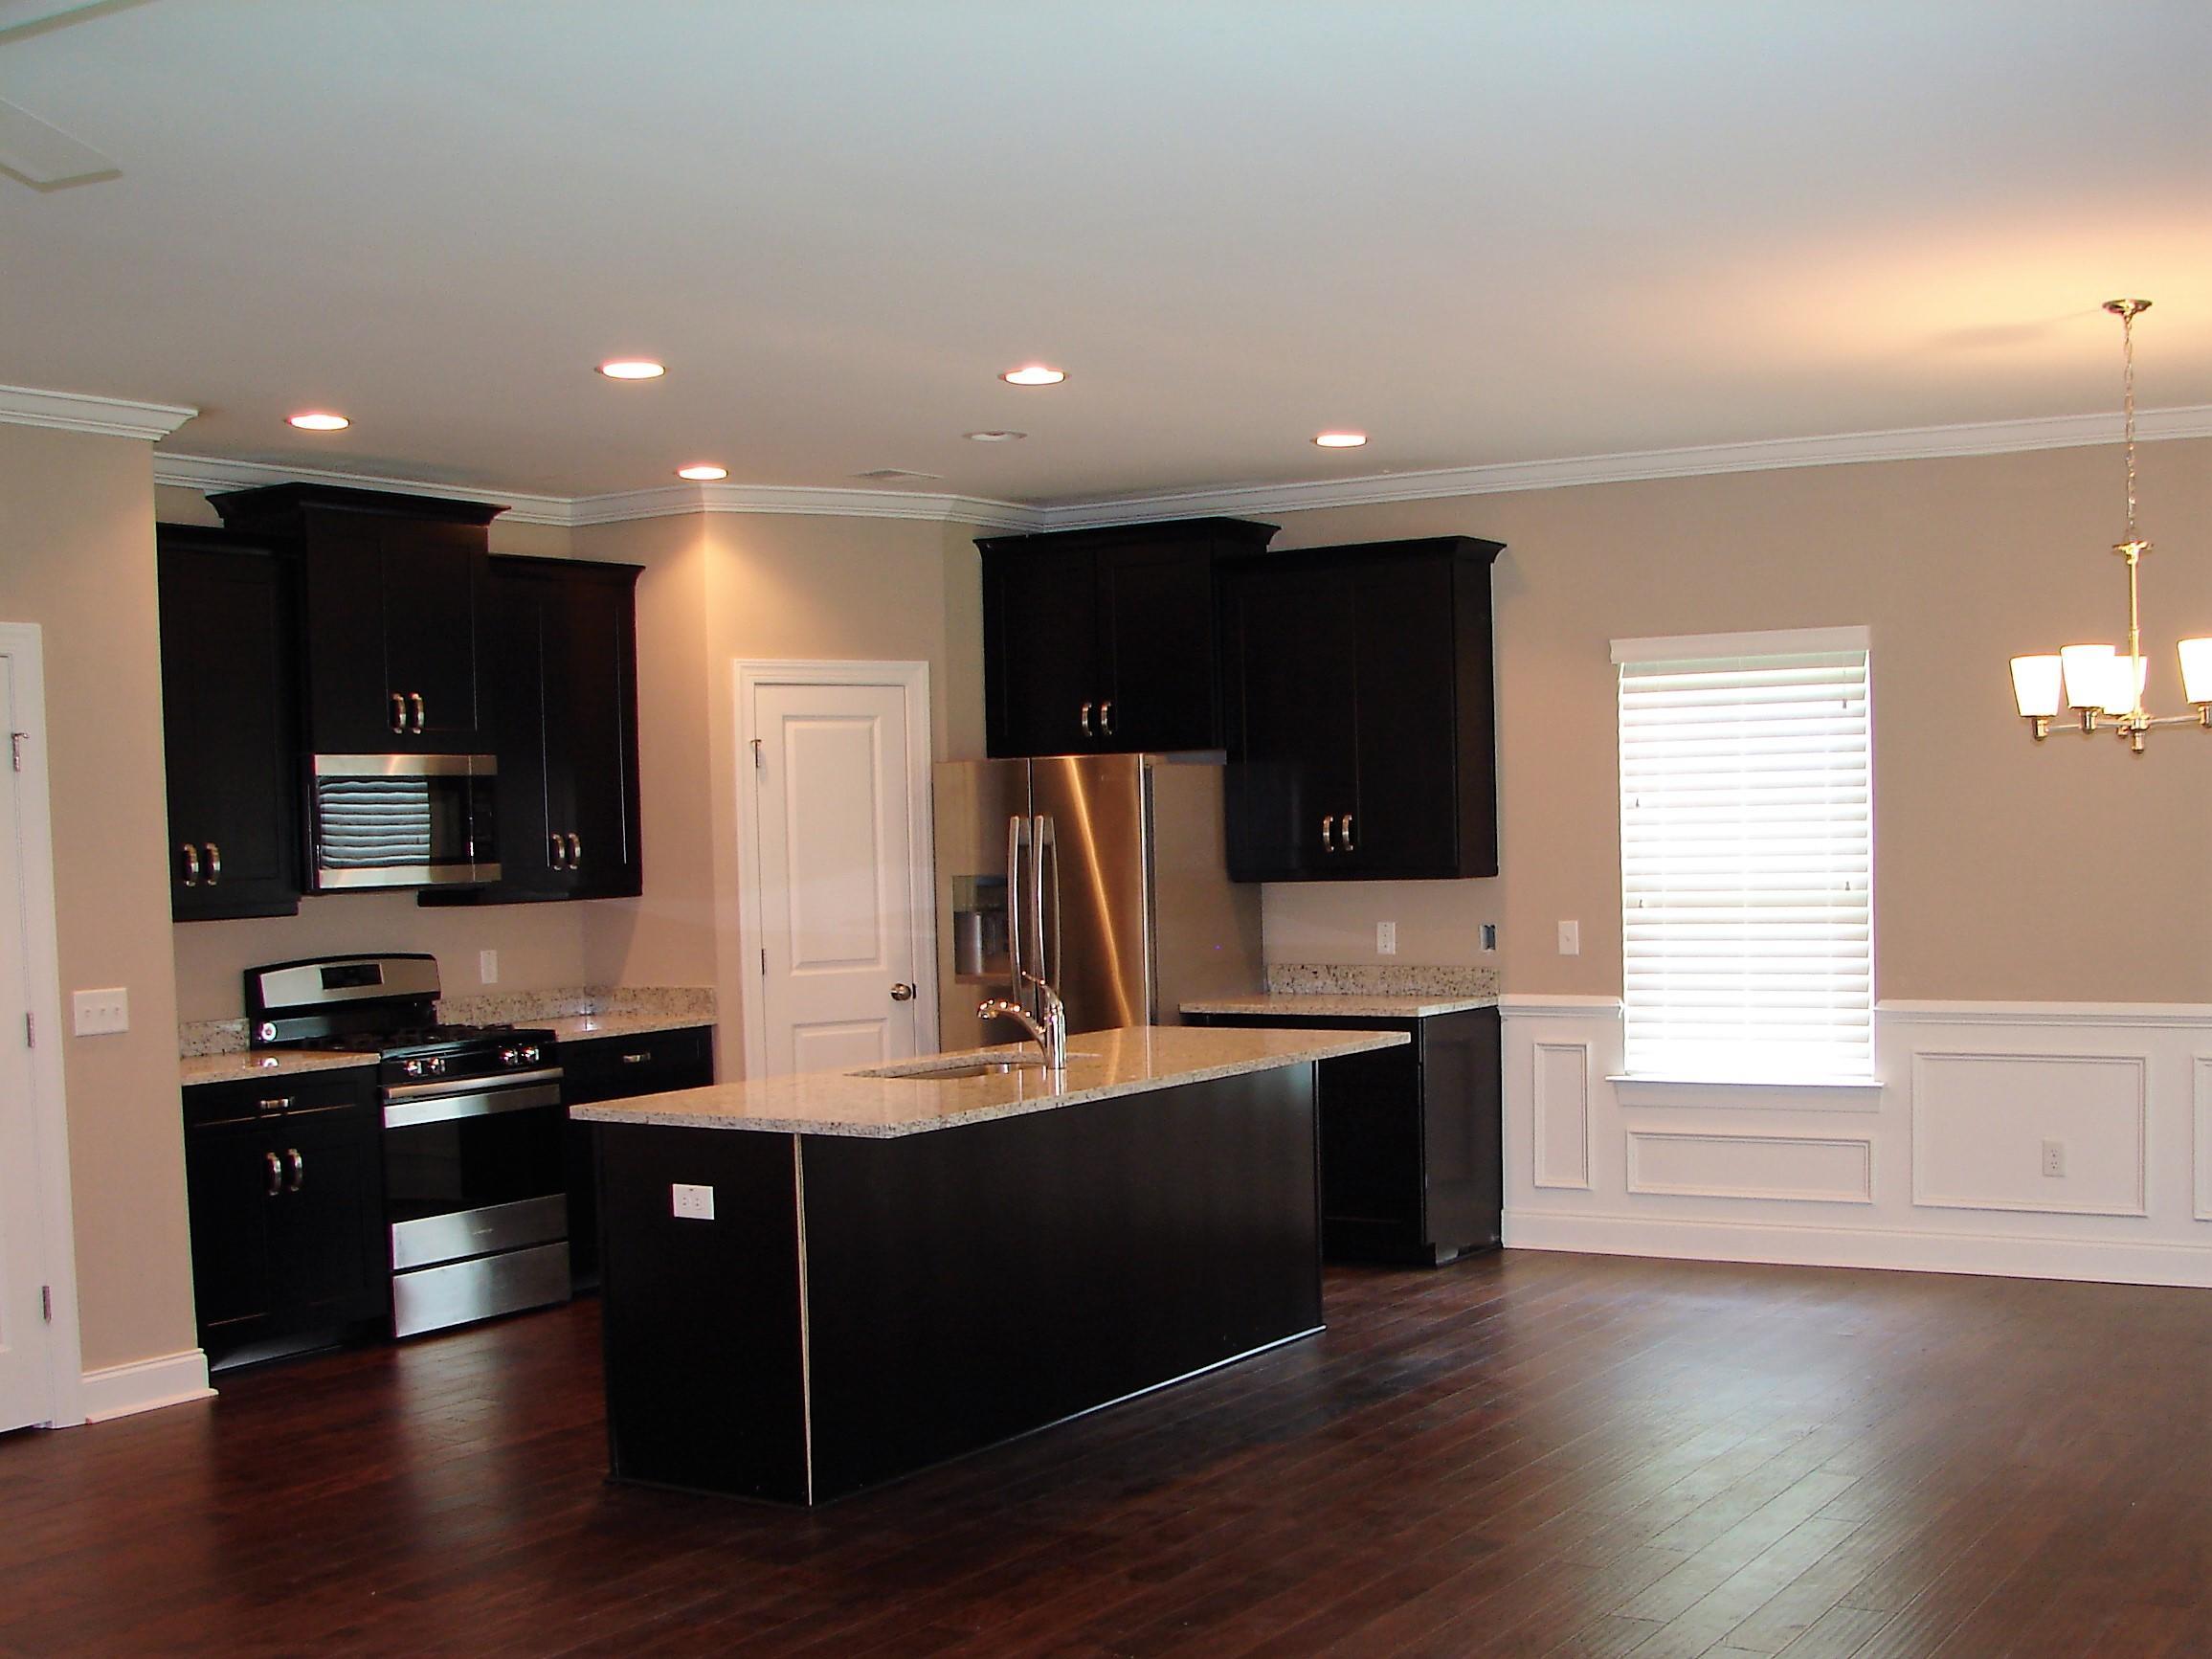 Filbin Creek Homes For Sale - 1173 Sumner, North Charleston, SC - 16